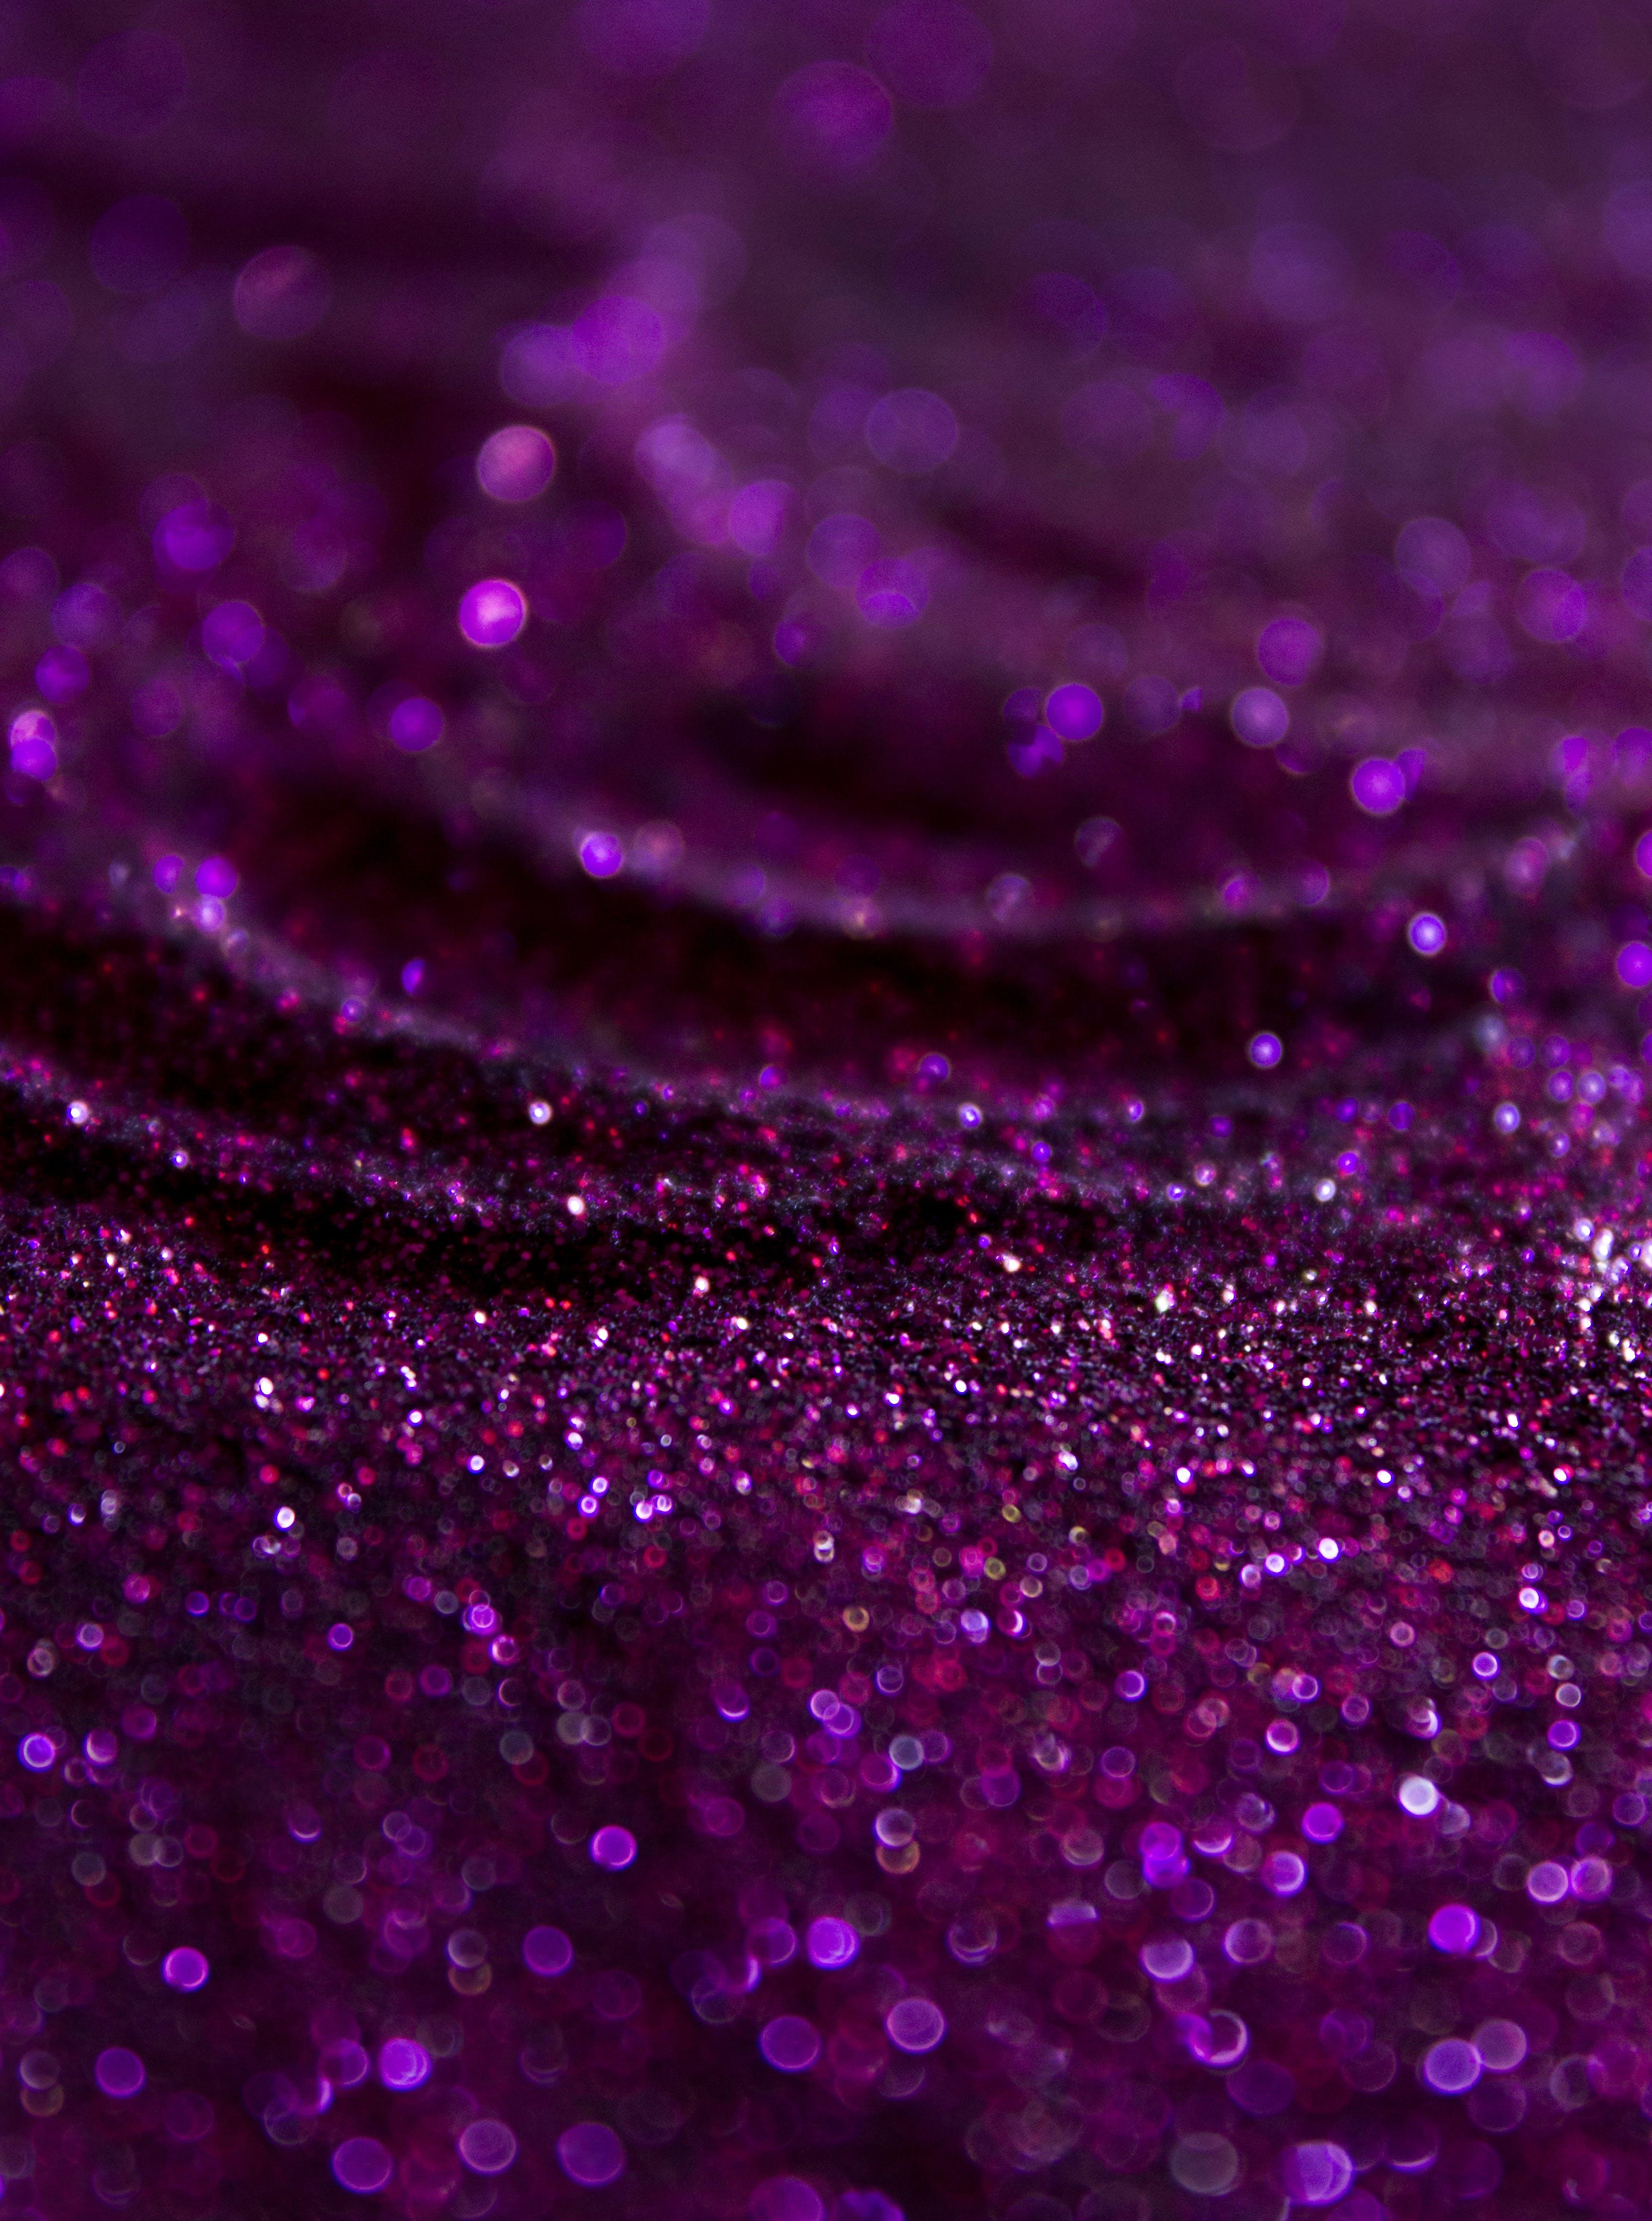 Free stock photo of glitter, Purple glitter